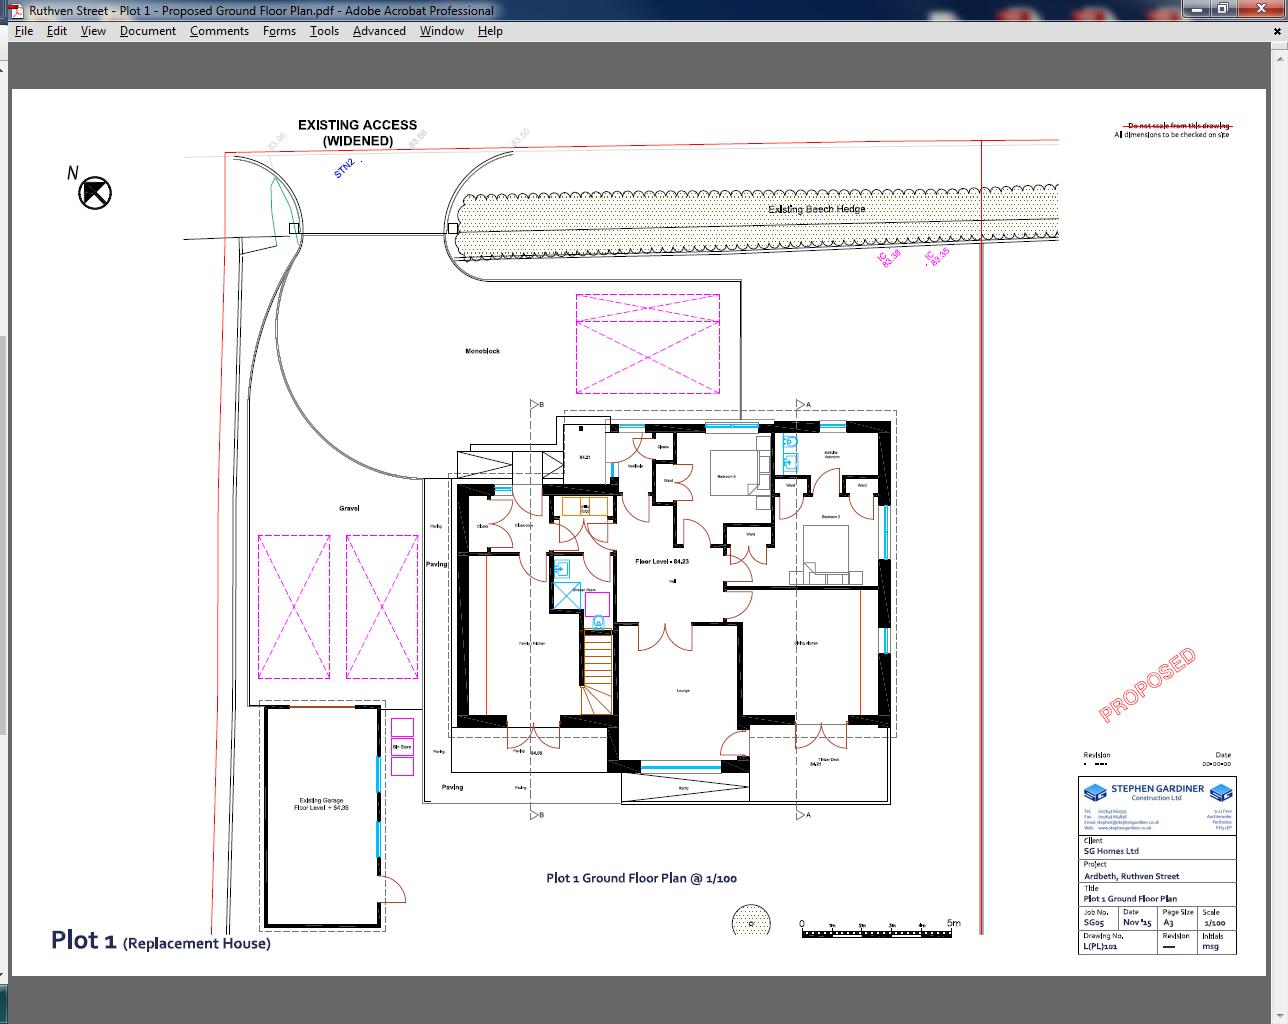 Ruthven Street - Plot 1 - Proposed First Floor Plan & Elevations